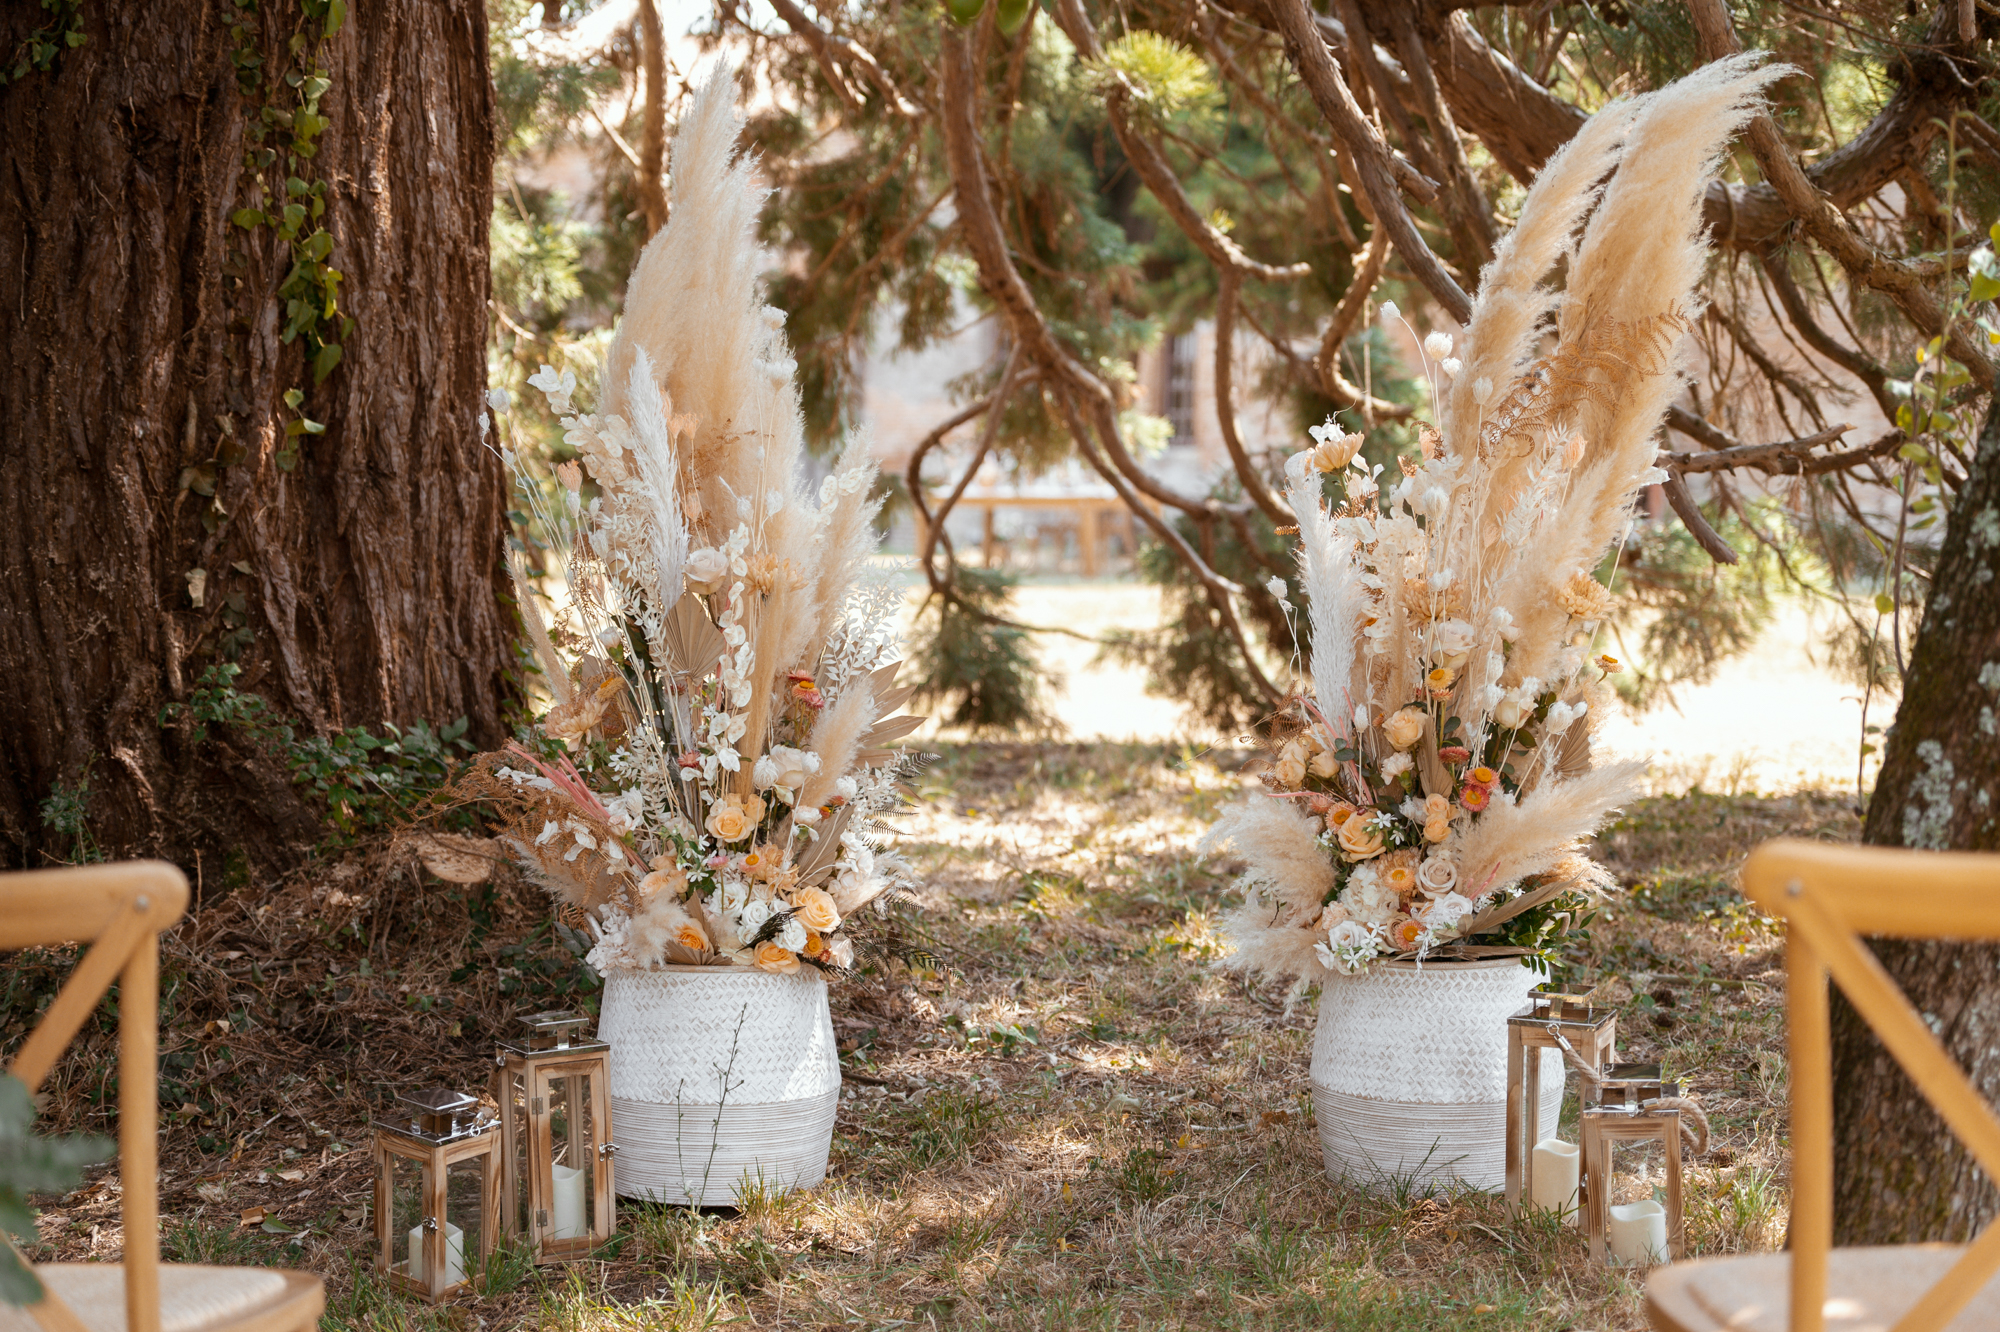 Outdoor wedding ceremony under tree